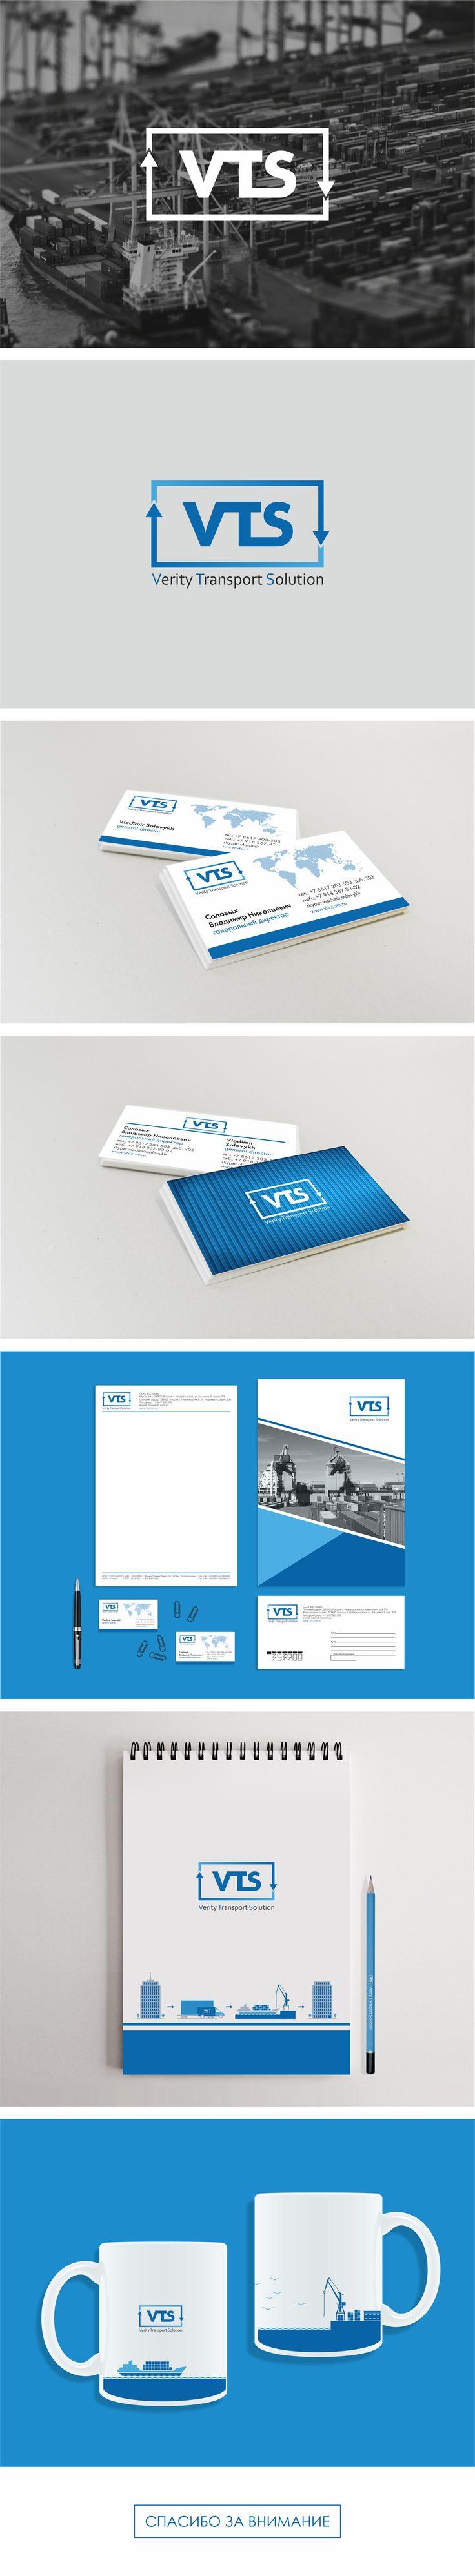 VTS. Logo. Identity Branding. Business Card. Letterhead. Notebook. Landing page.  VTS. Логотип. Фирменный стиль. Визитная карточка. Блокнот. Сувенирная продукция.